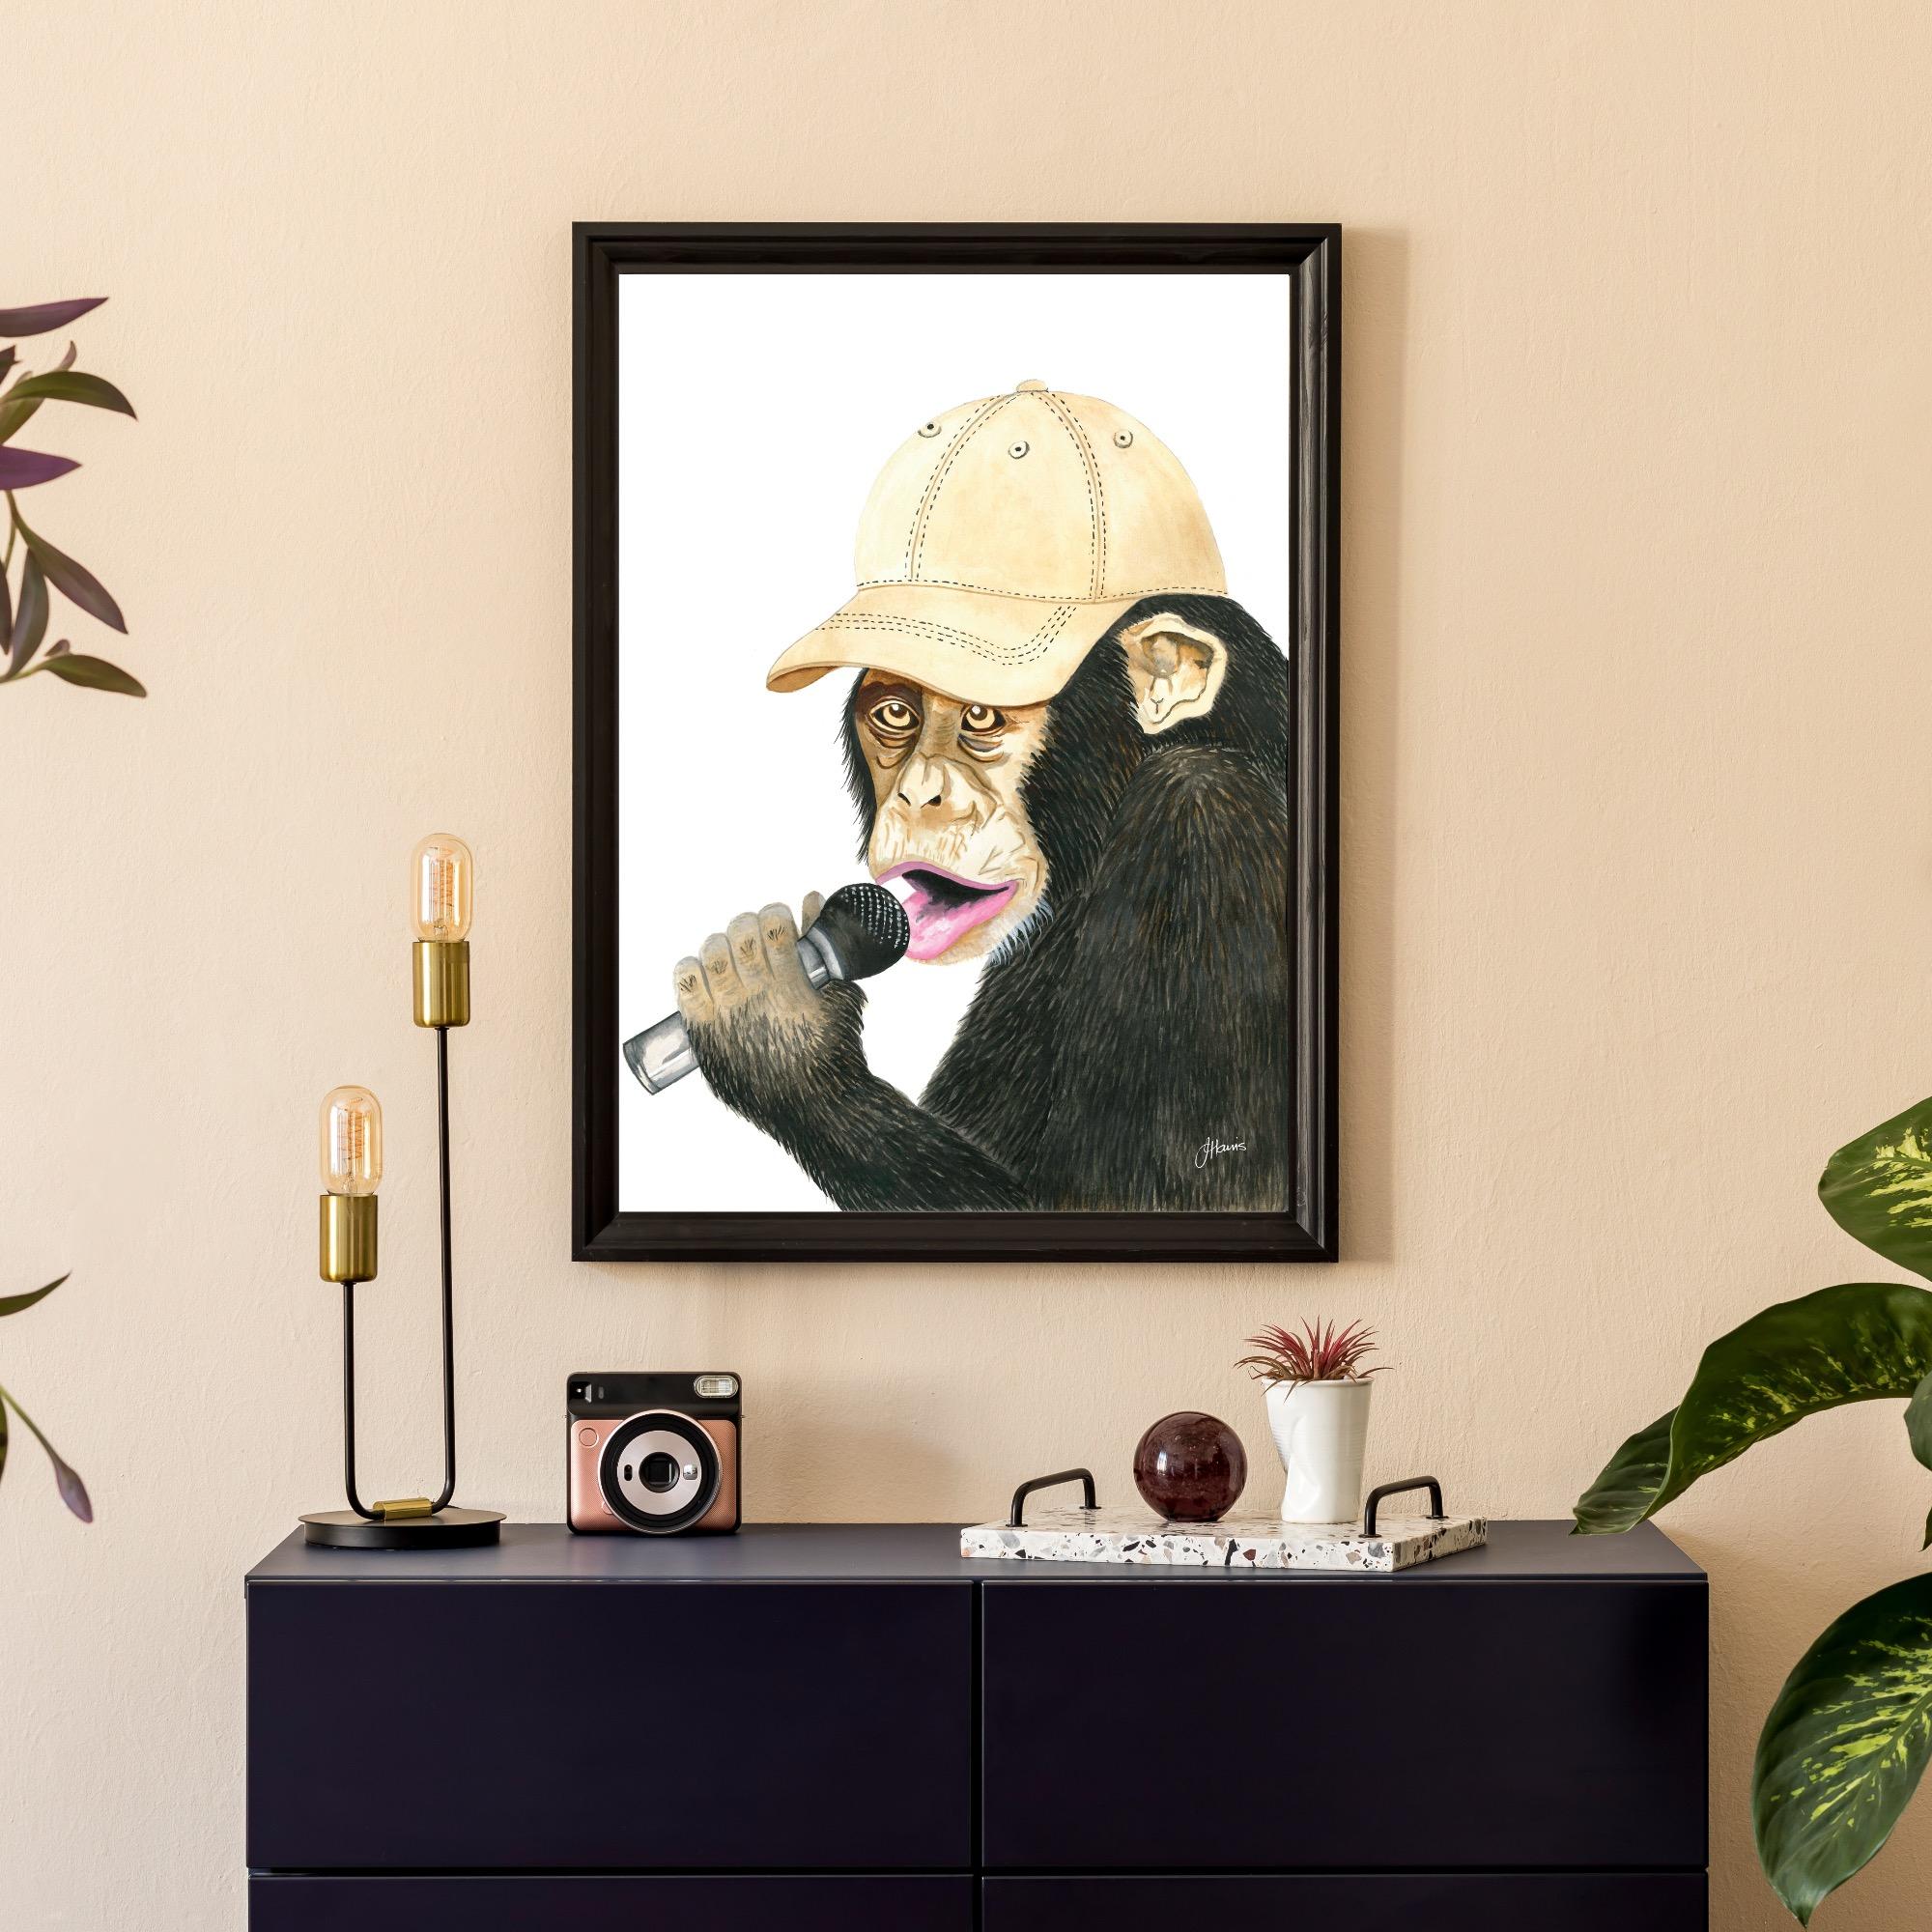 Alfie the Music Monkey